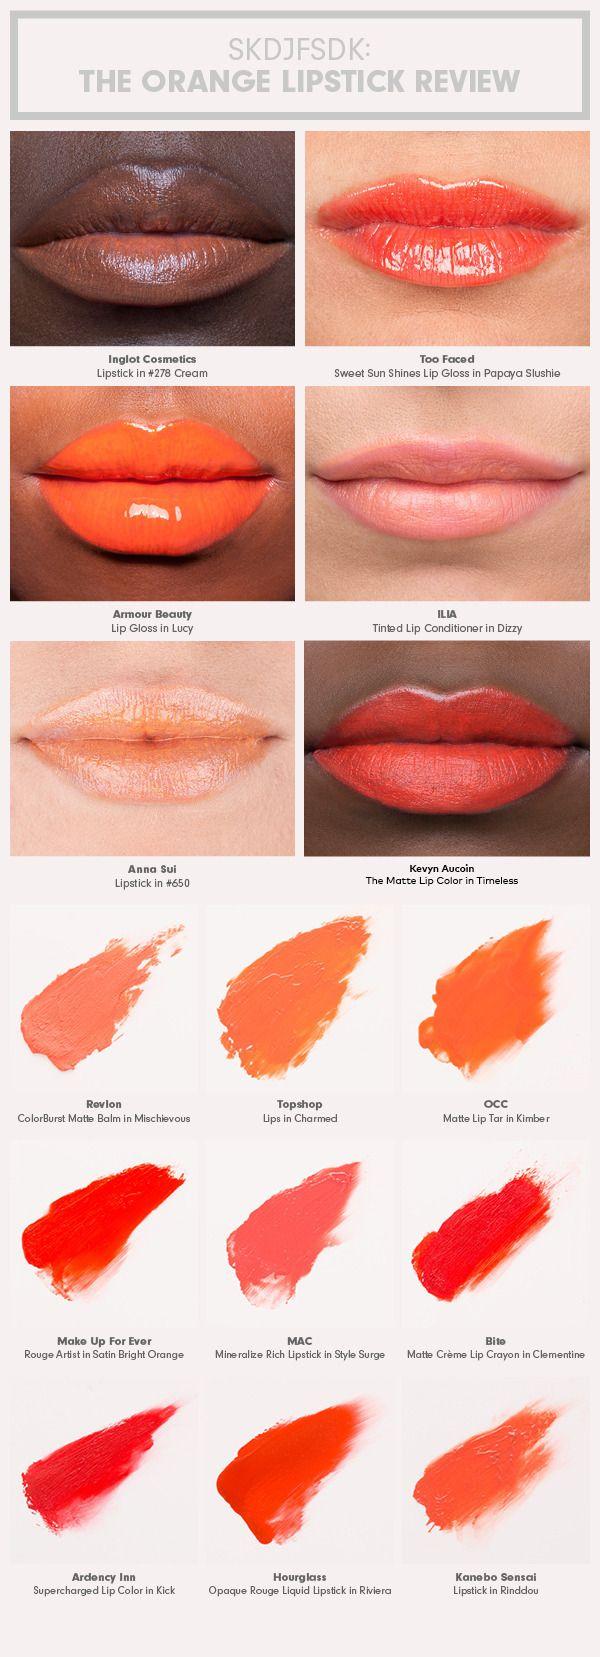 Sunny Side Up: The Orange Lipstick Review | Beautylish